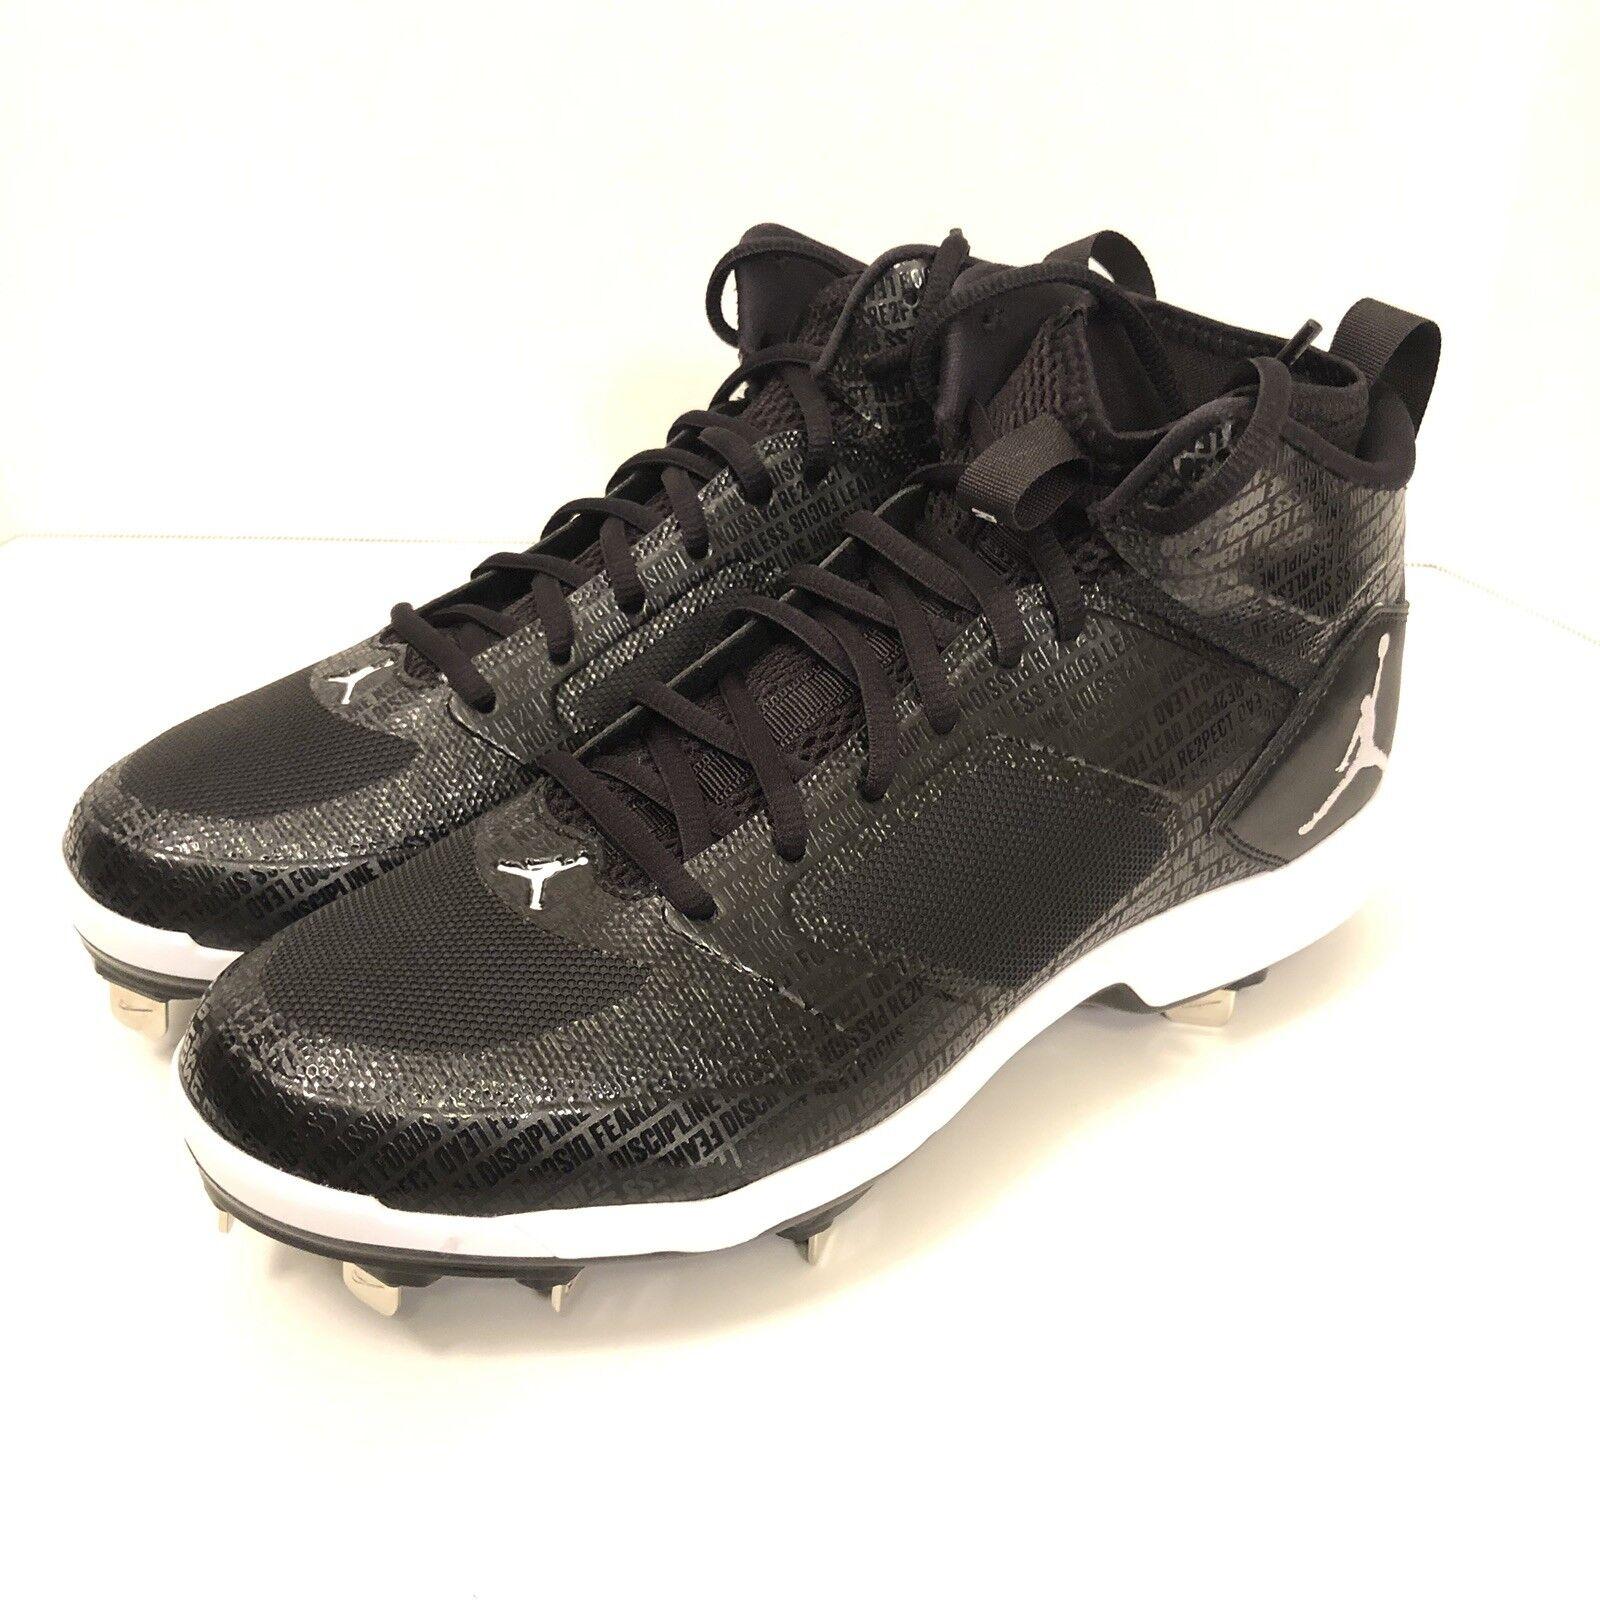 Nike Air Jordan Jeter Black Baseball Cleats Re2pect Mens Size 8.5 AO2914-002 New